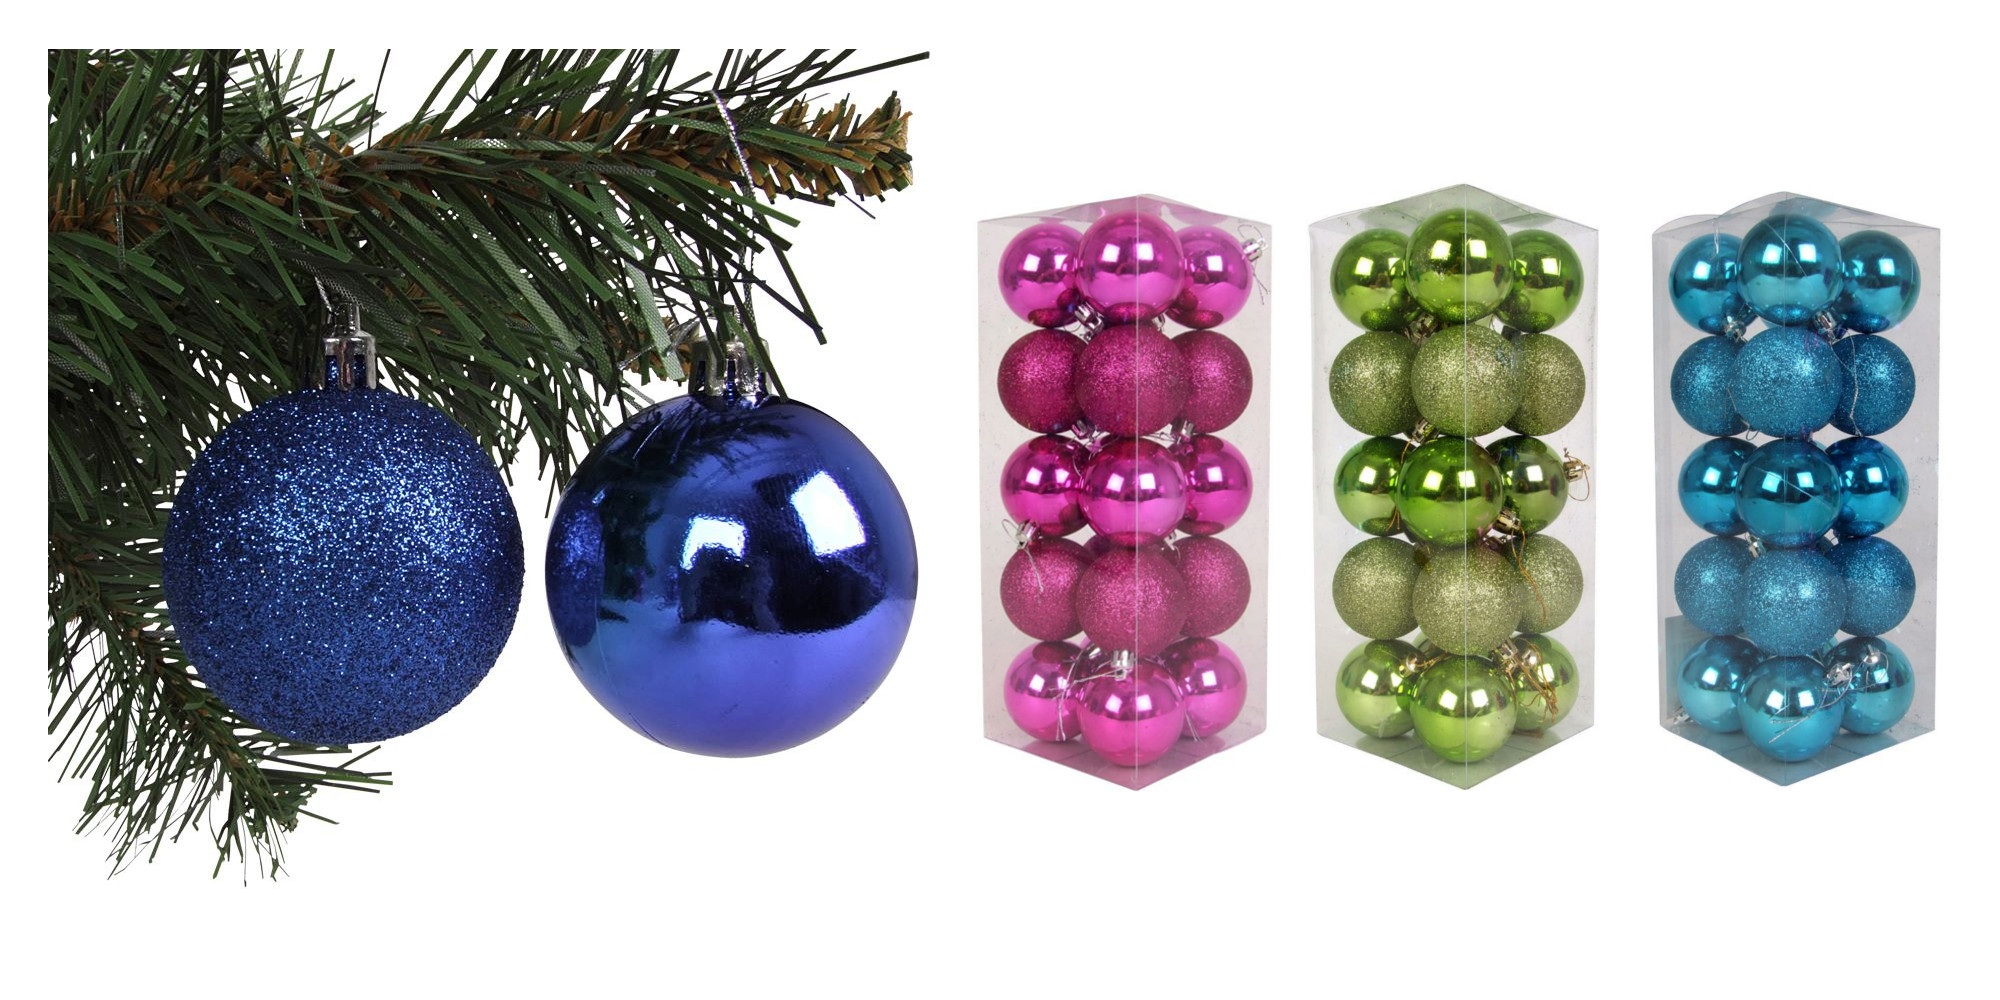 Christbaumkugeln Türkis Kunststoff.Weihnachtsbaumkugeln 20er Set Christbaumkugeln Baumschmuck 6cm Weihnachtsdeko